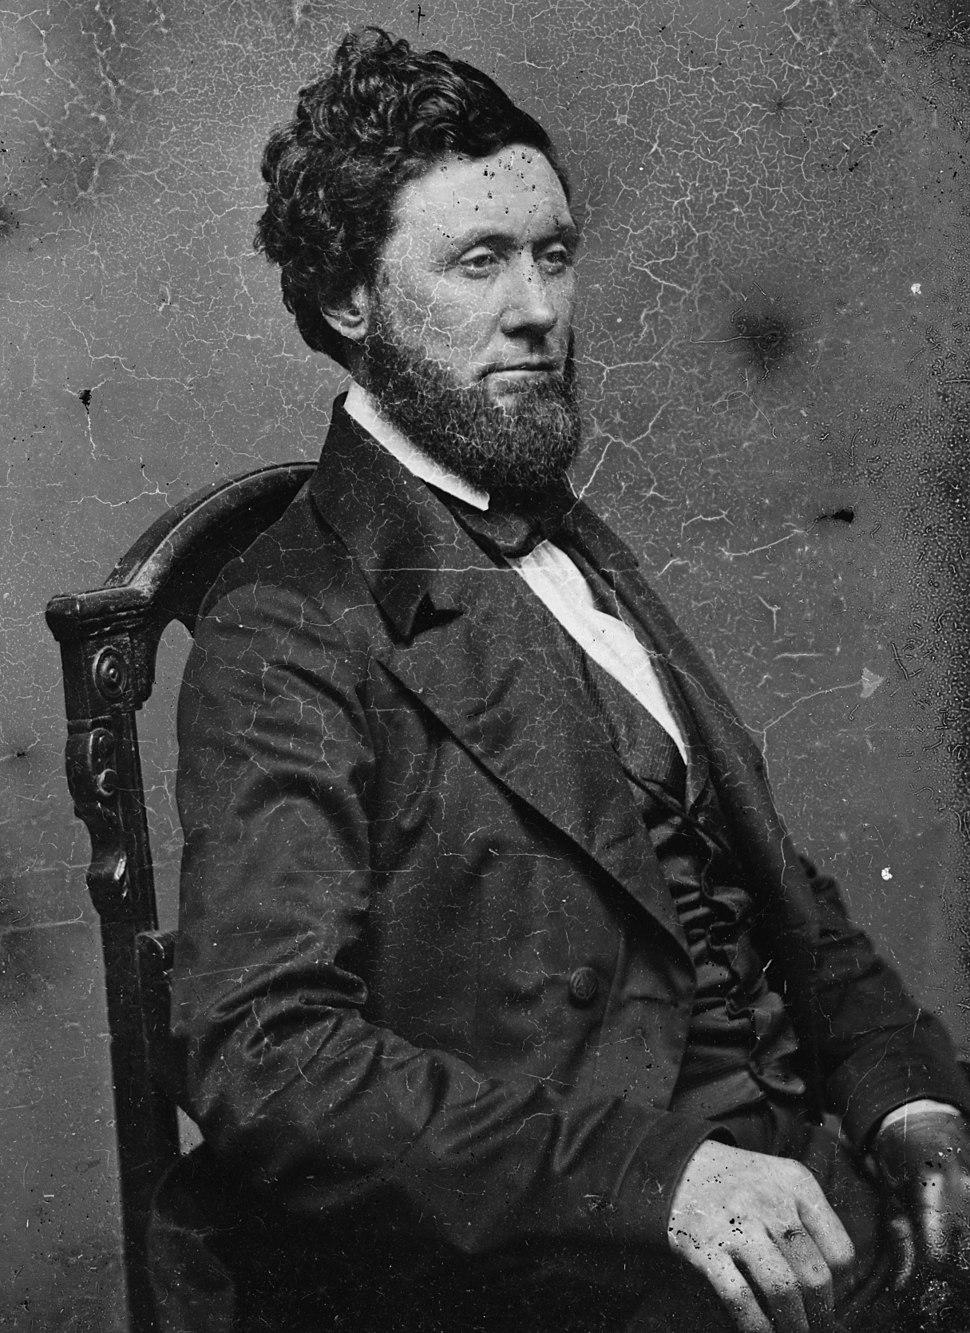 John Nelson, bw photo portrait, Brady-Handy collection, circa 1855-1865.jpg